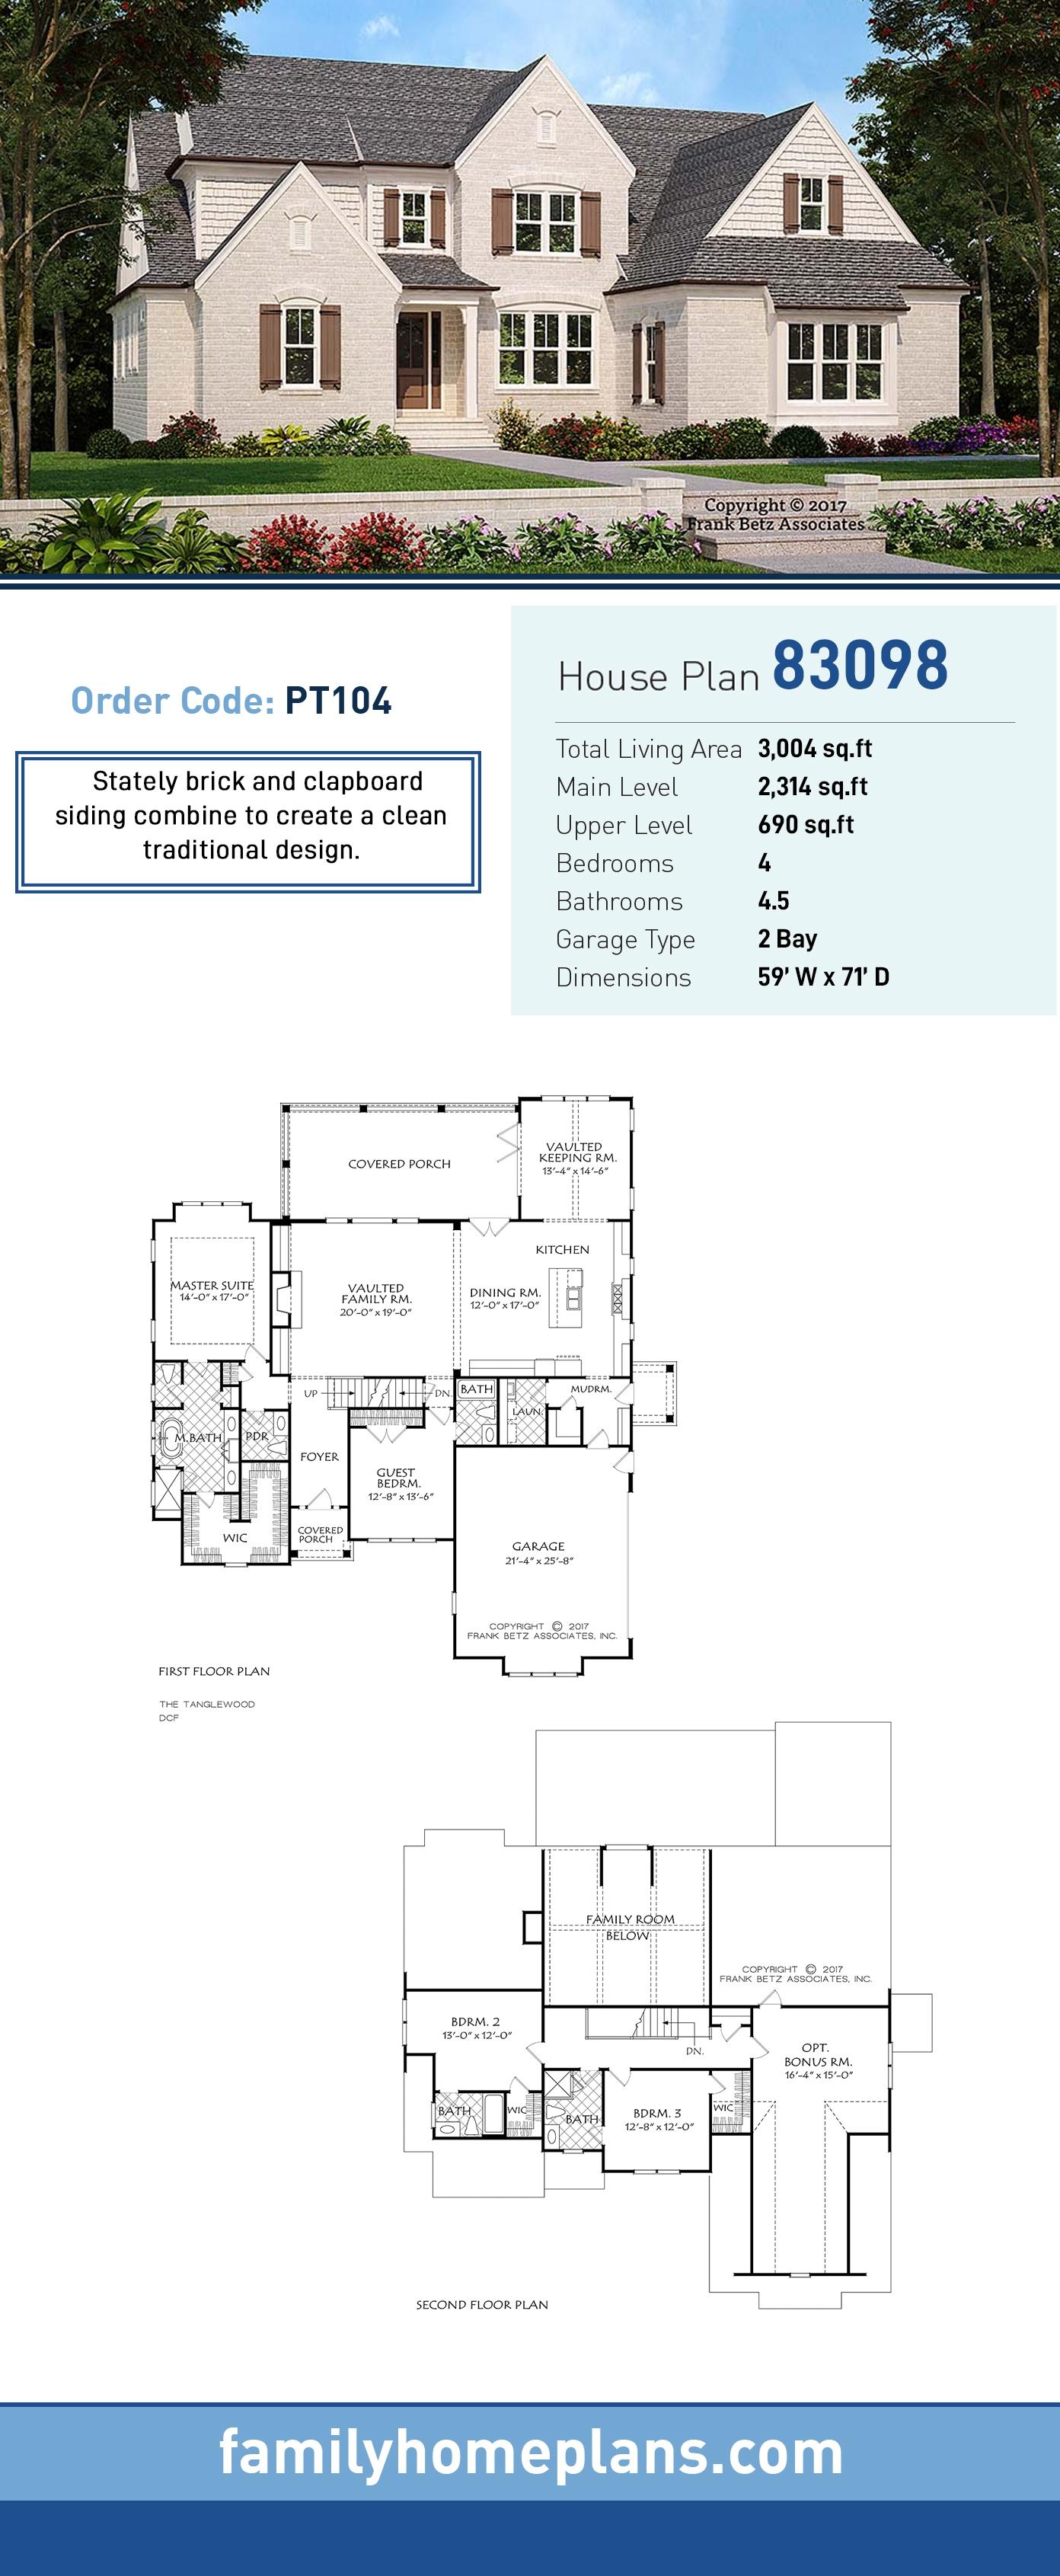 European, Traditional, Tudor House Plan 83098 with 4 Beds, 5 Baths, 2 Car Garage